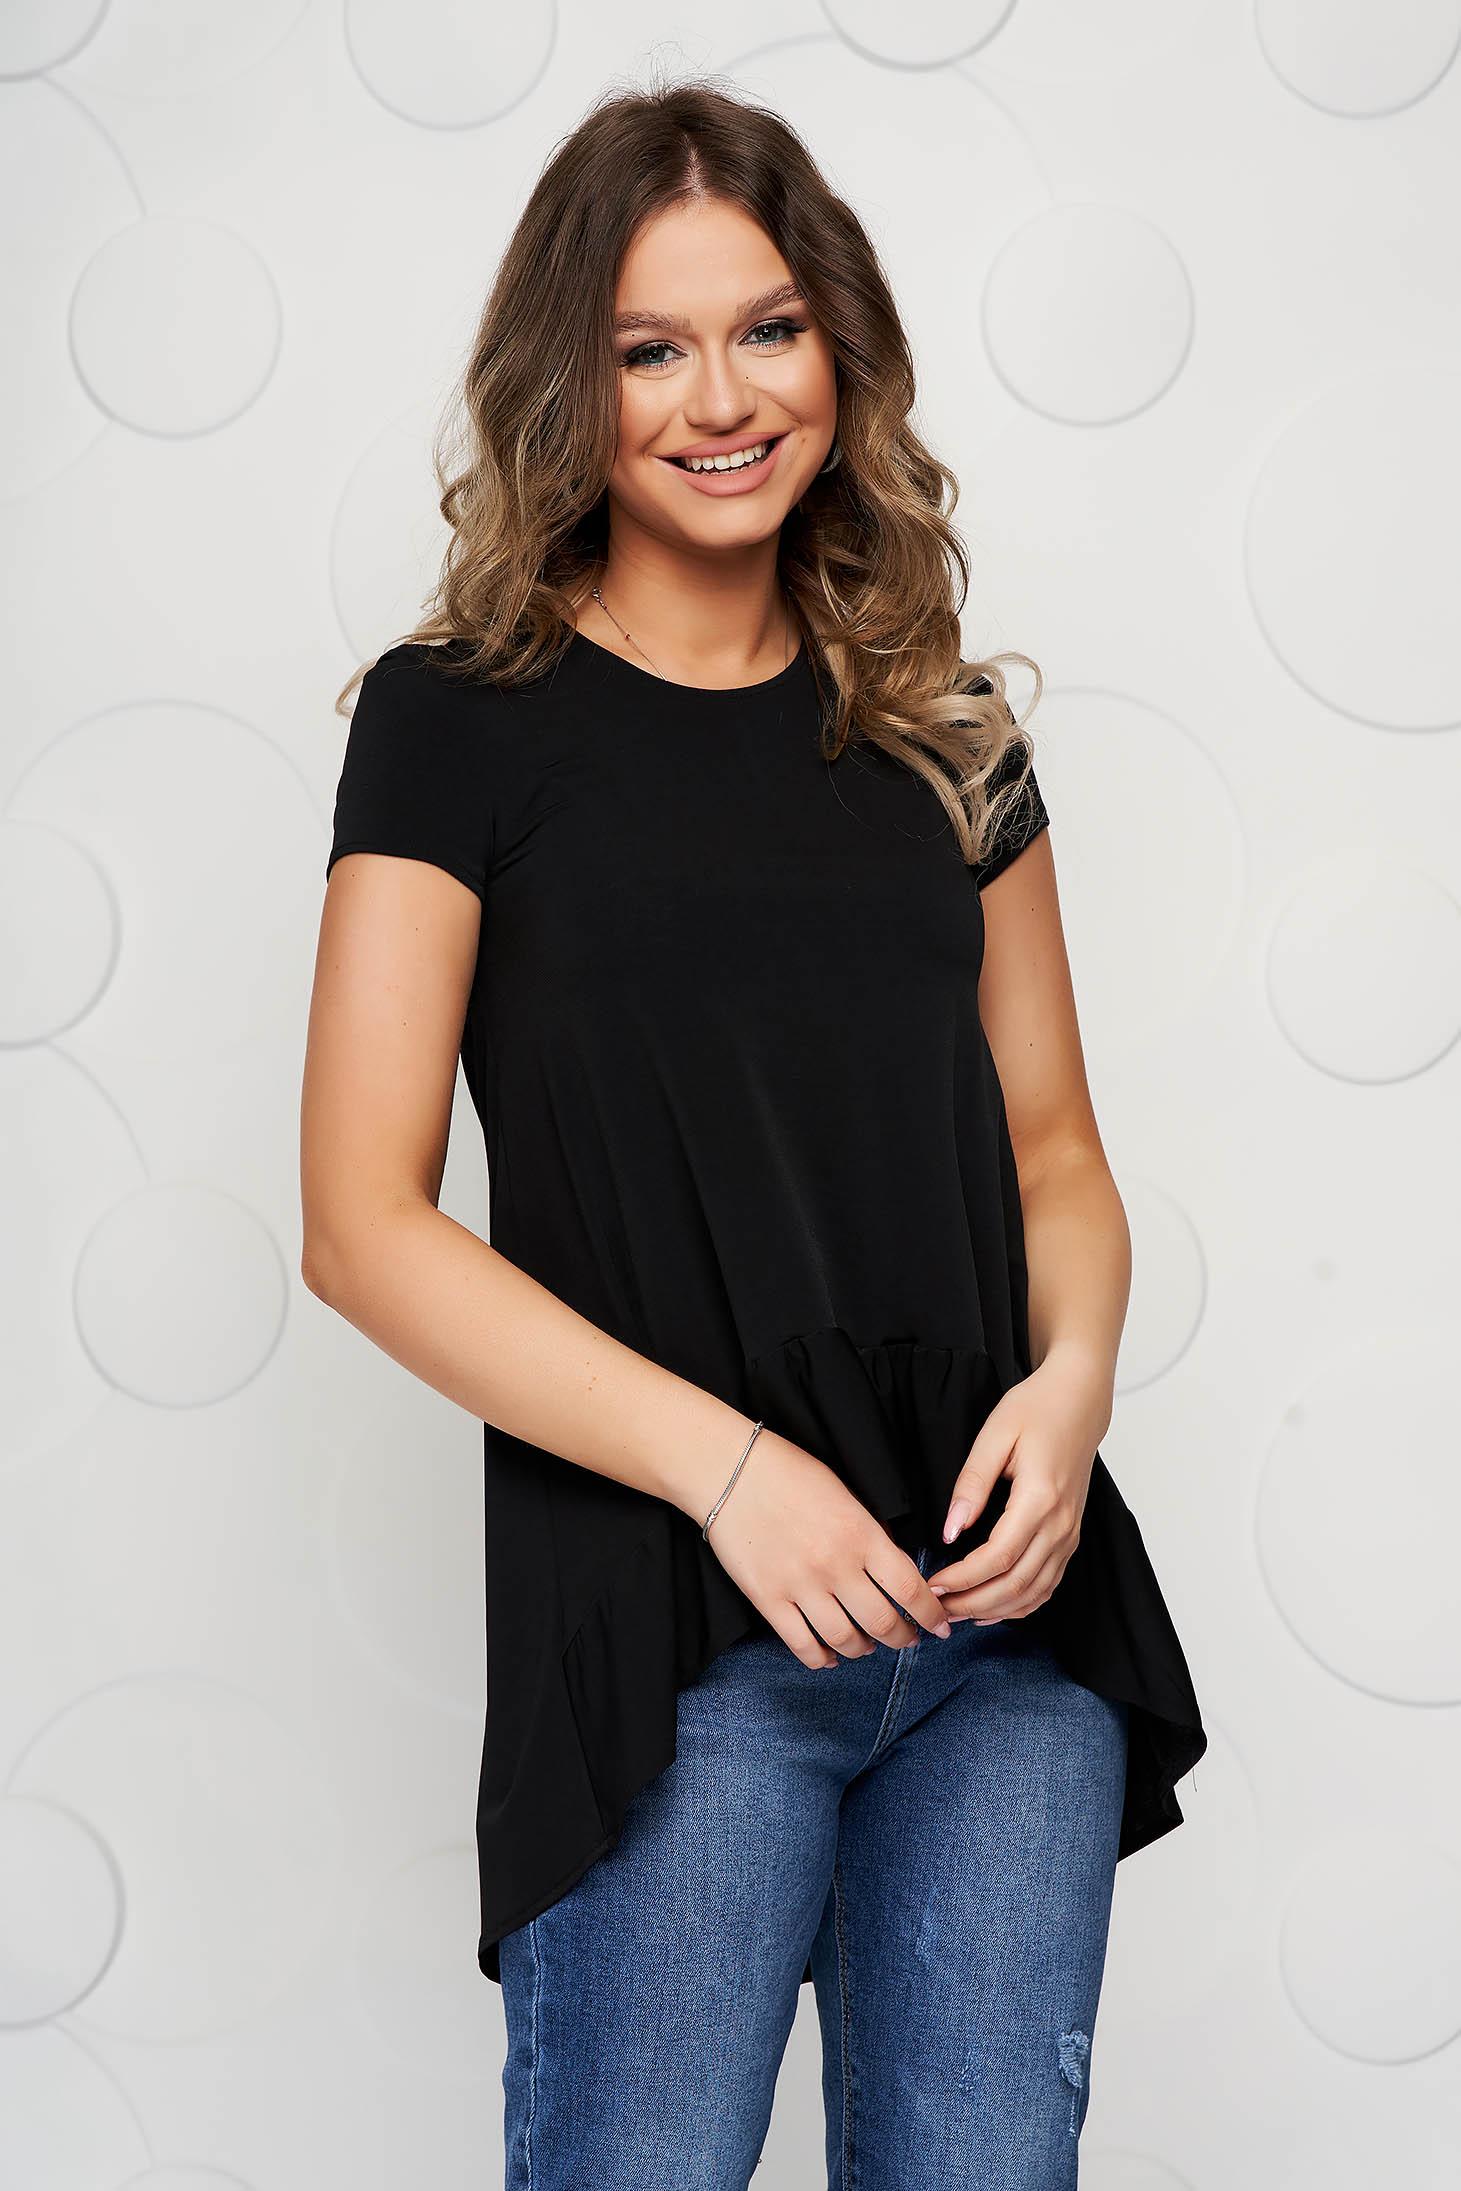 Bluza dama StarShinerS neagra asimetrica cu croi larg din material subtire cu volanase